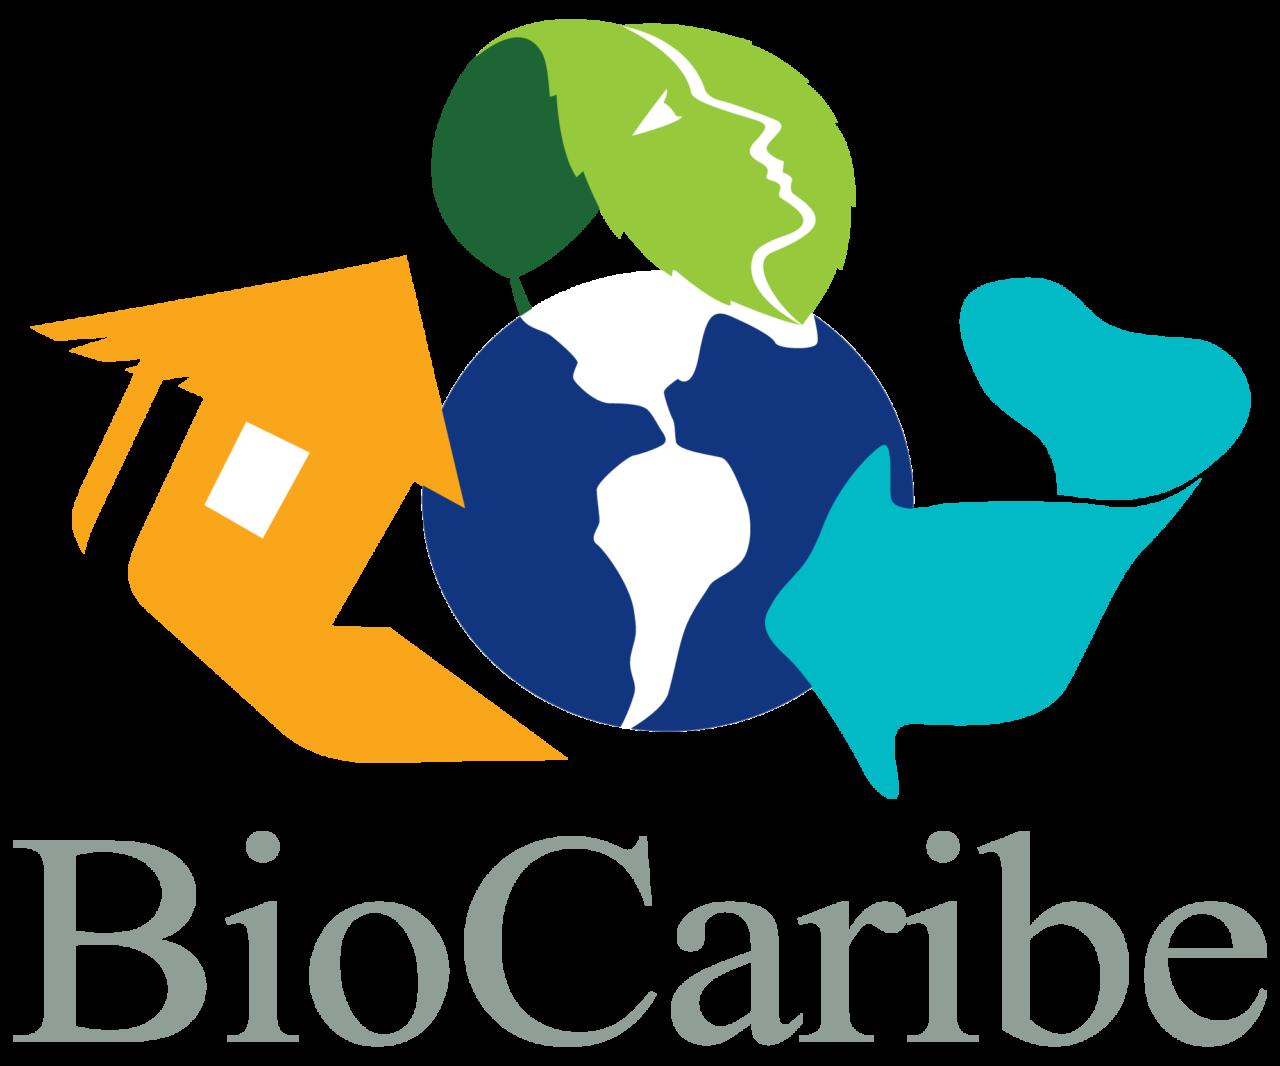 BioCaribe